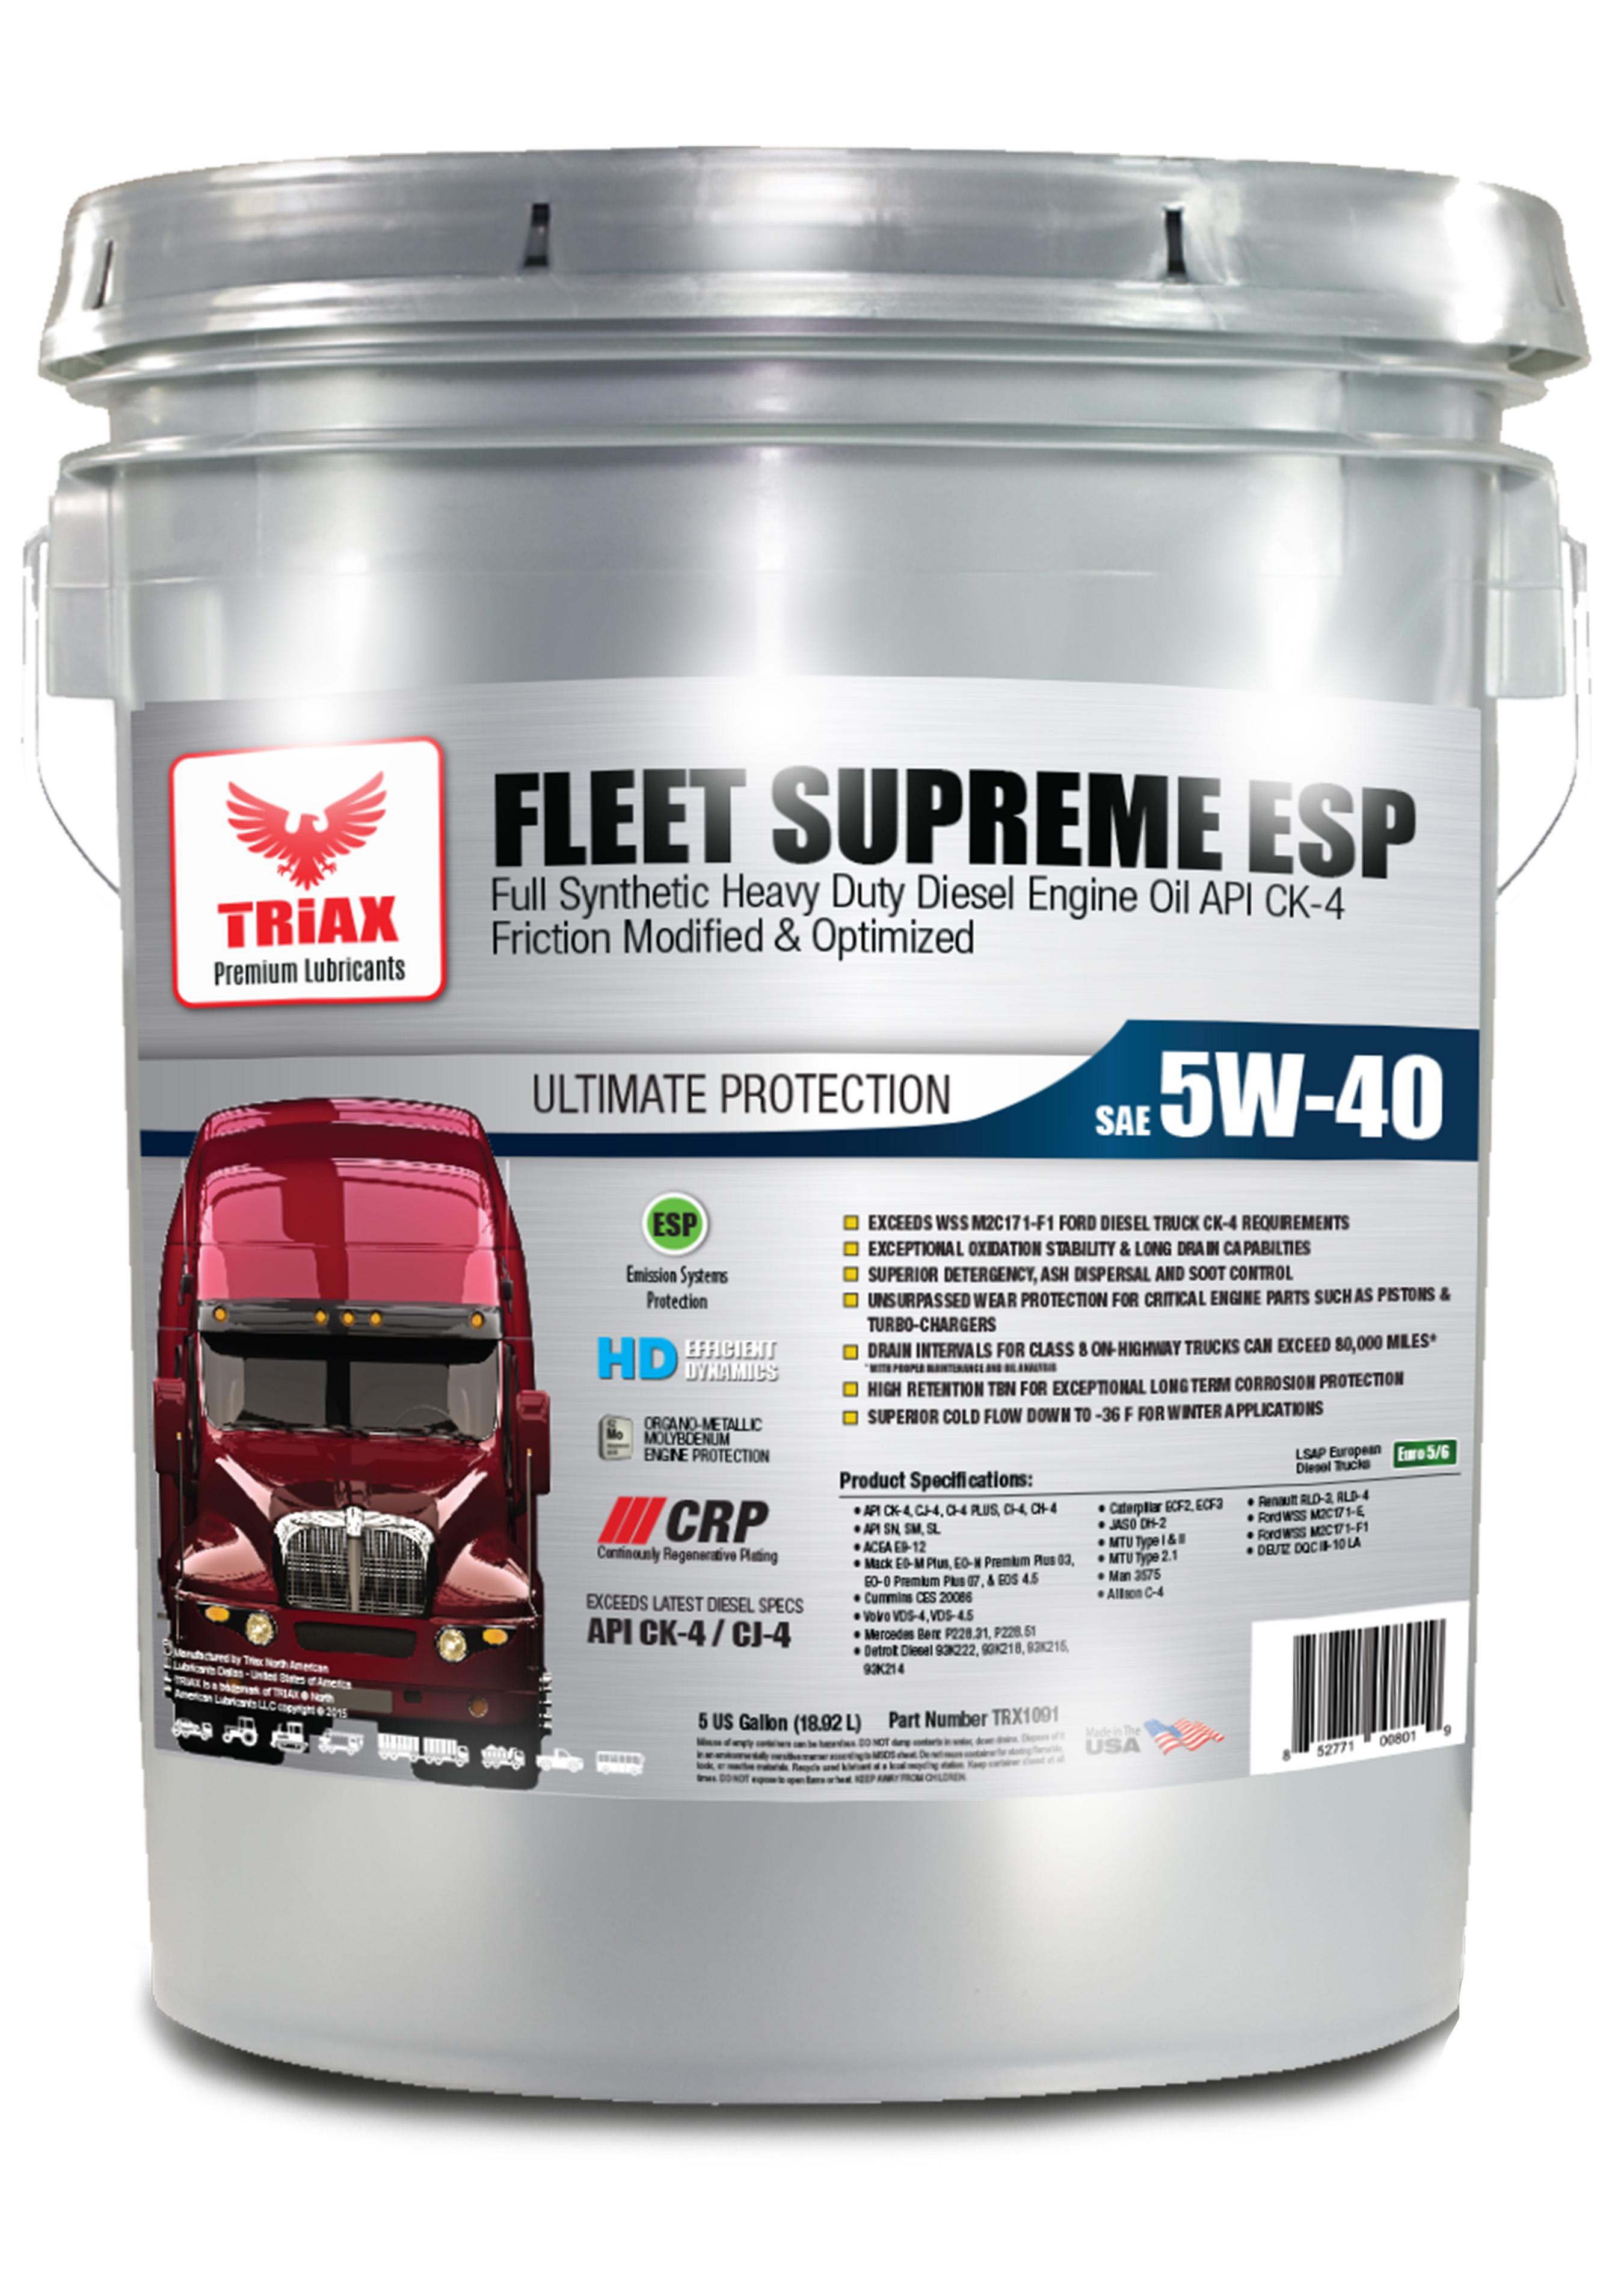 TRIAX Fleet Supreme 5W-40 Full Synthetic - Heavy Duty Diesel | API CK-4 | VOLVO VDS-4.5 | MB 229.51